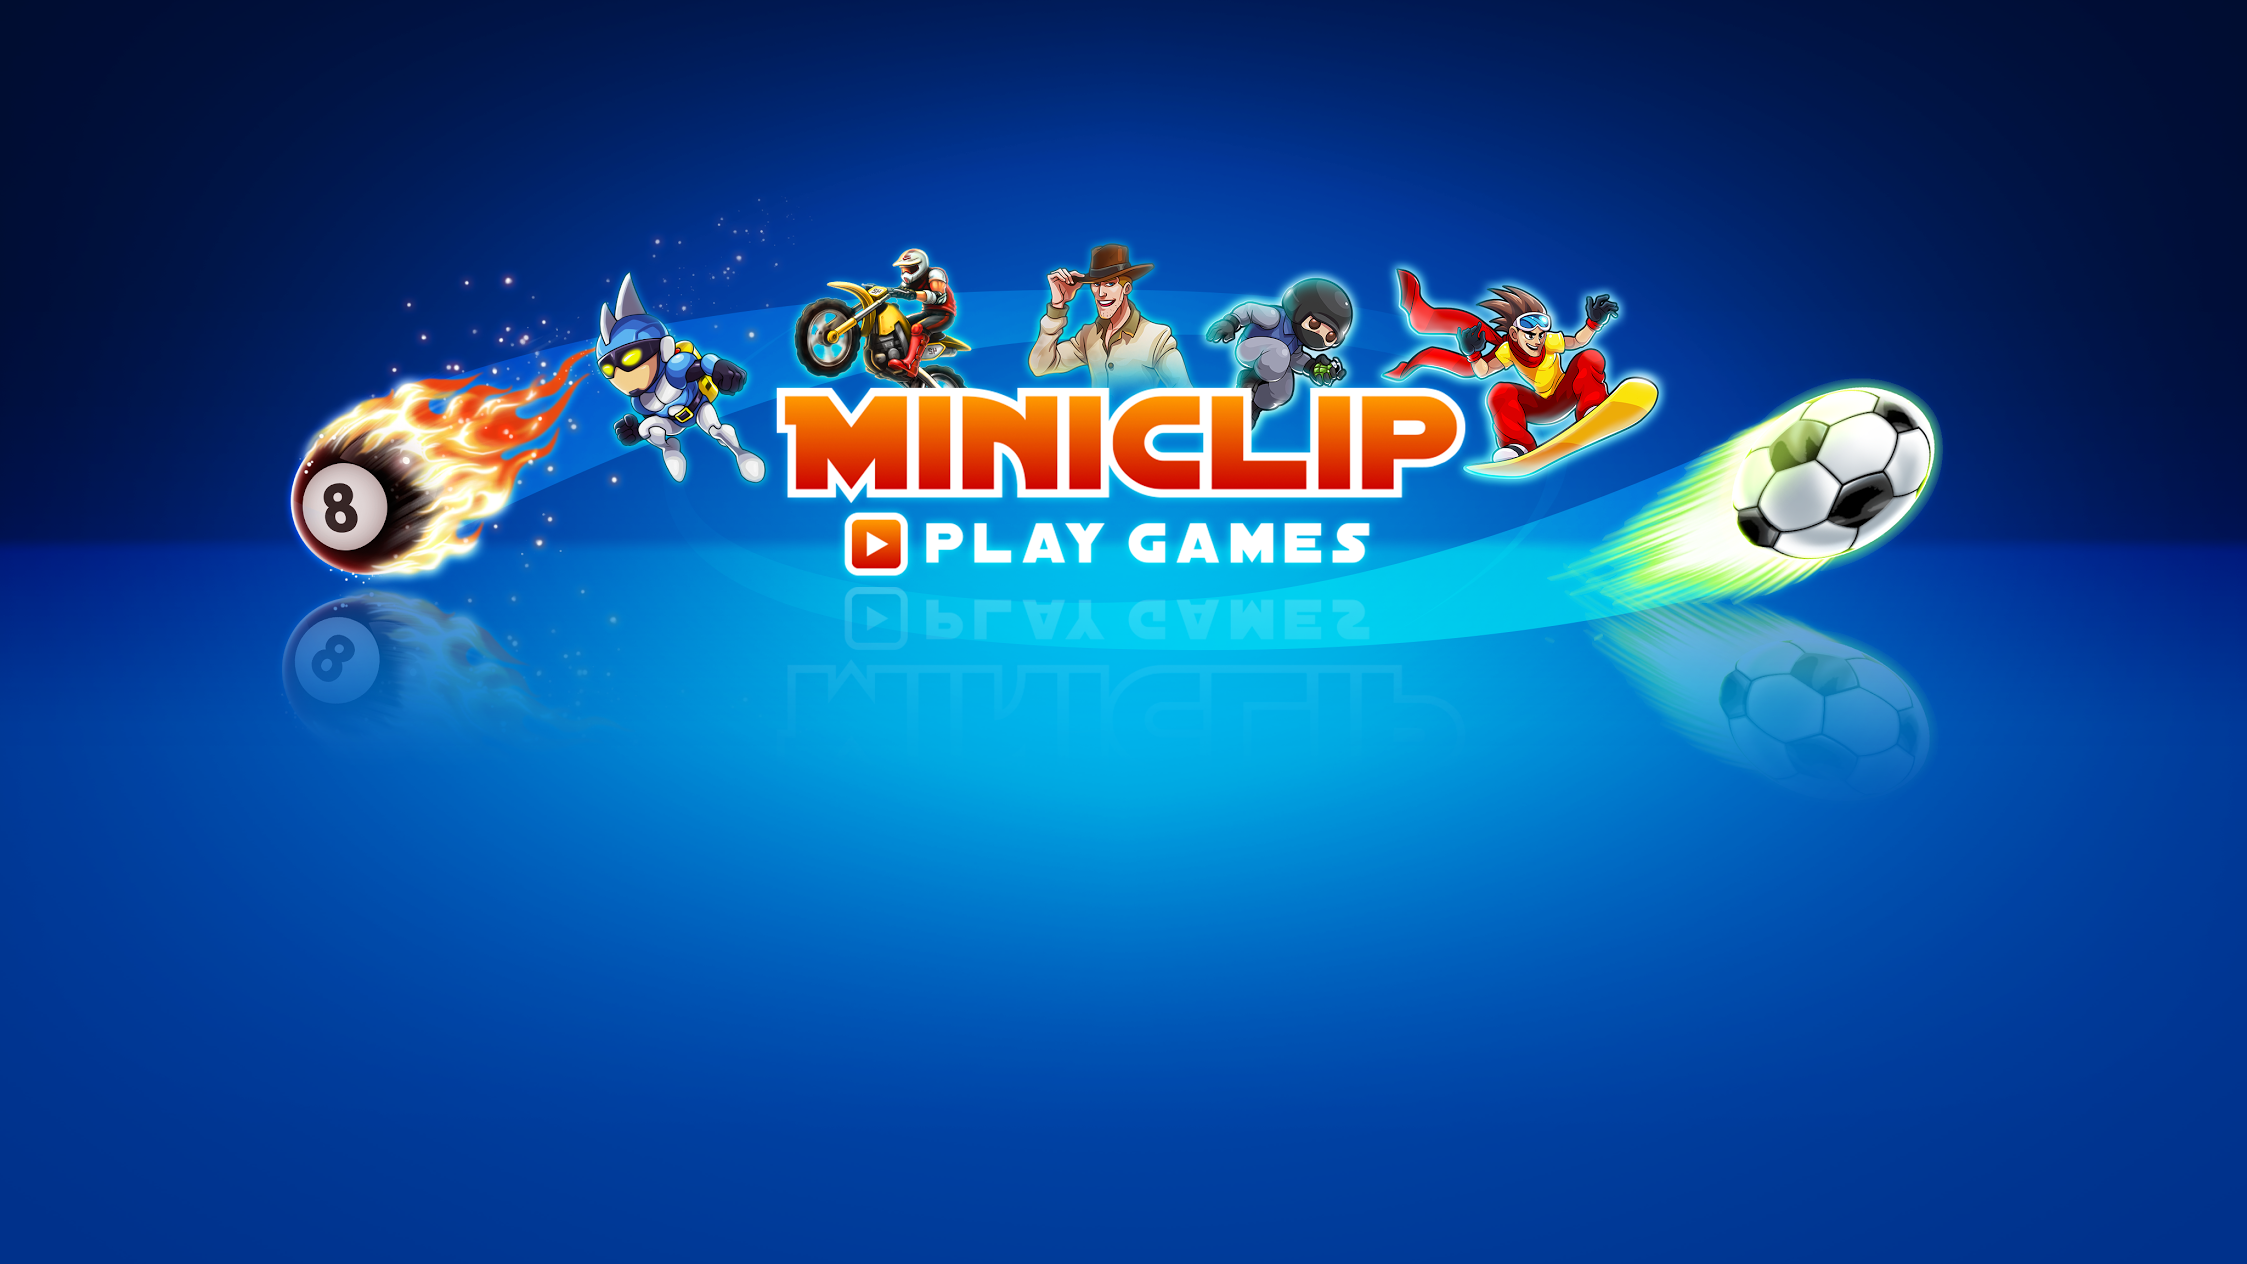 miniclip � miniclipcom play free online miniclip games